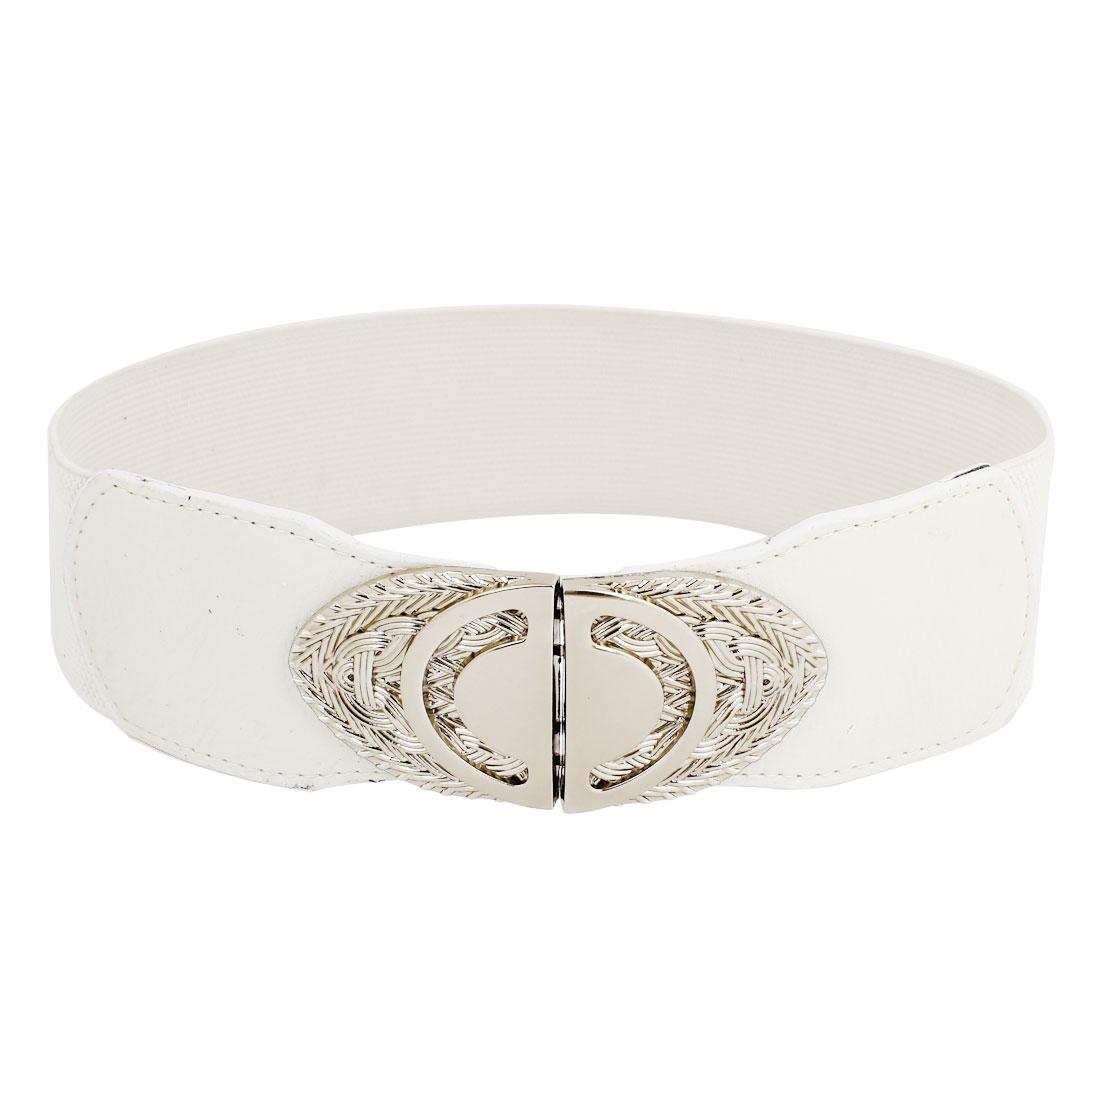 Gary Oval Interlocking Buckle Elastic Fabric Waist Cinch Belt Ivory for Women